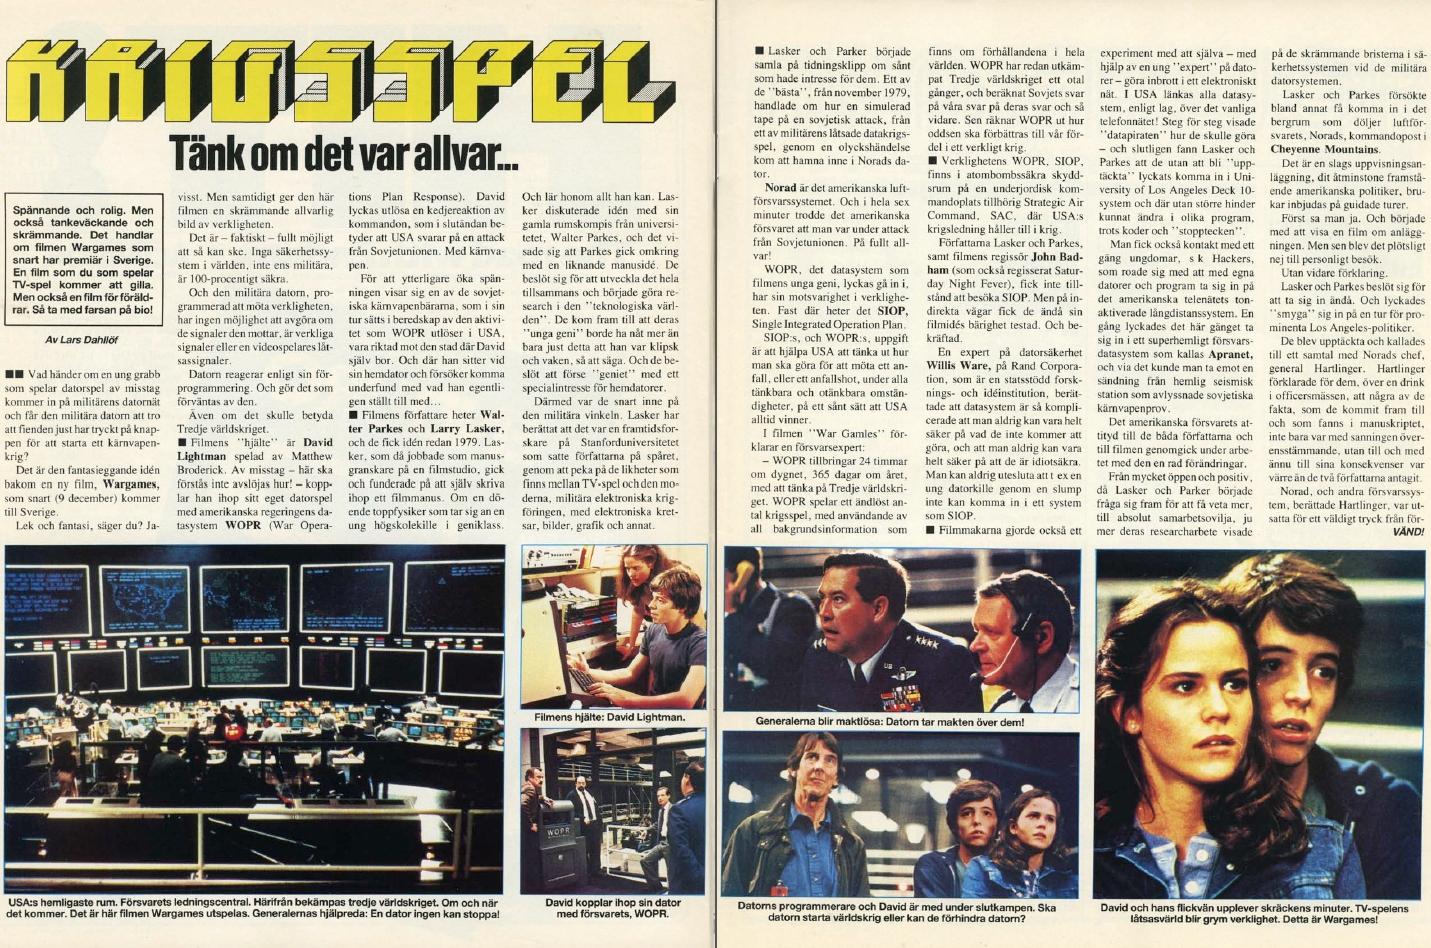 WarGames_Joystick_1983